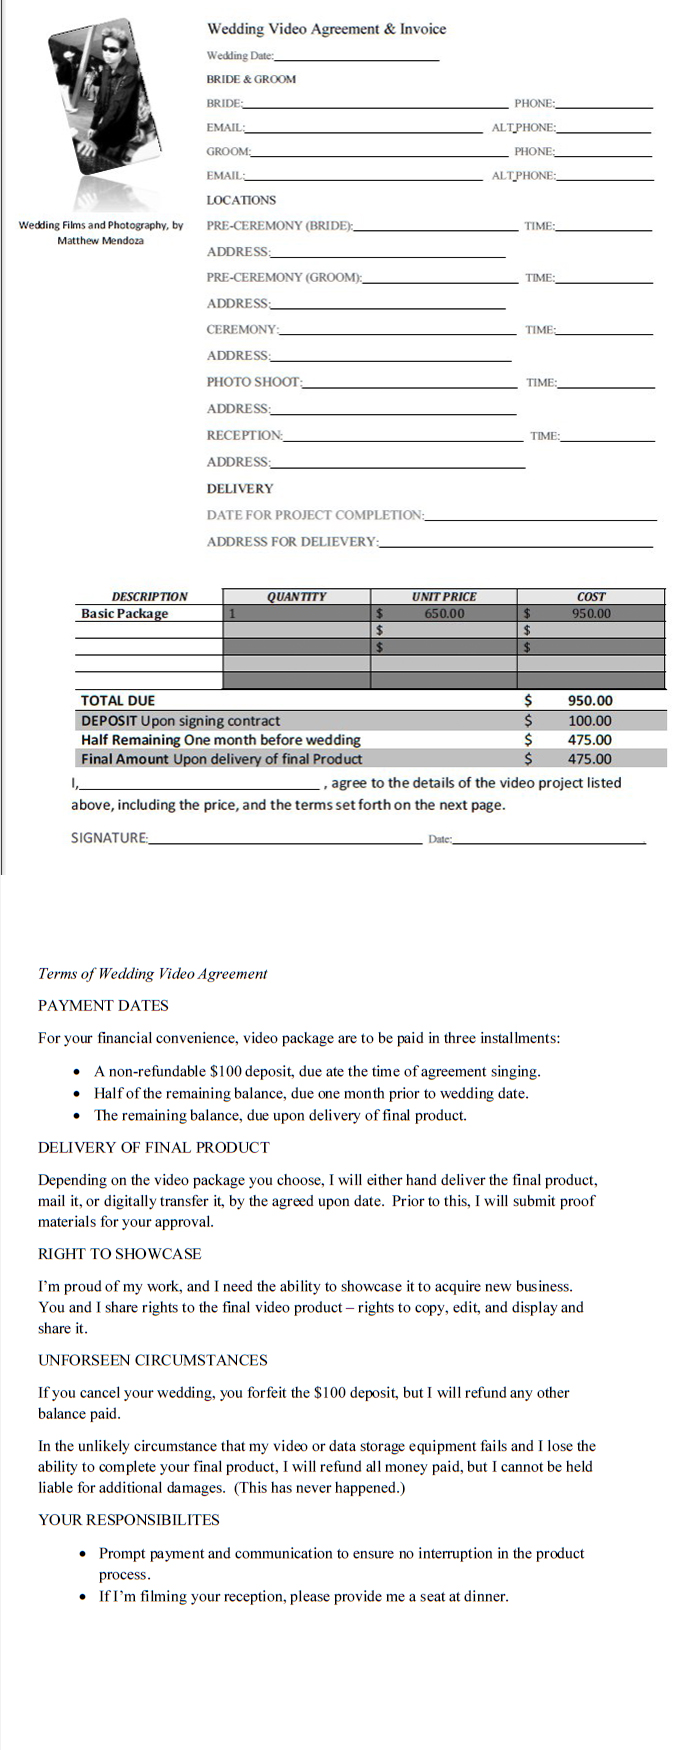 Invoice for wedding